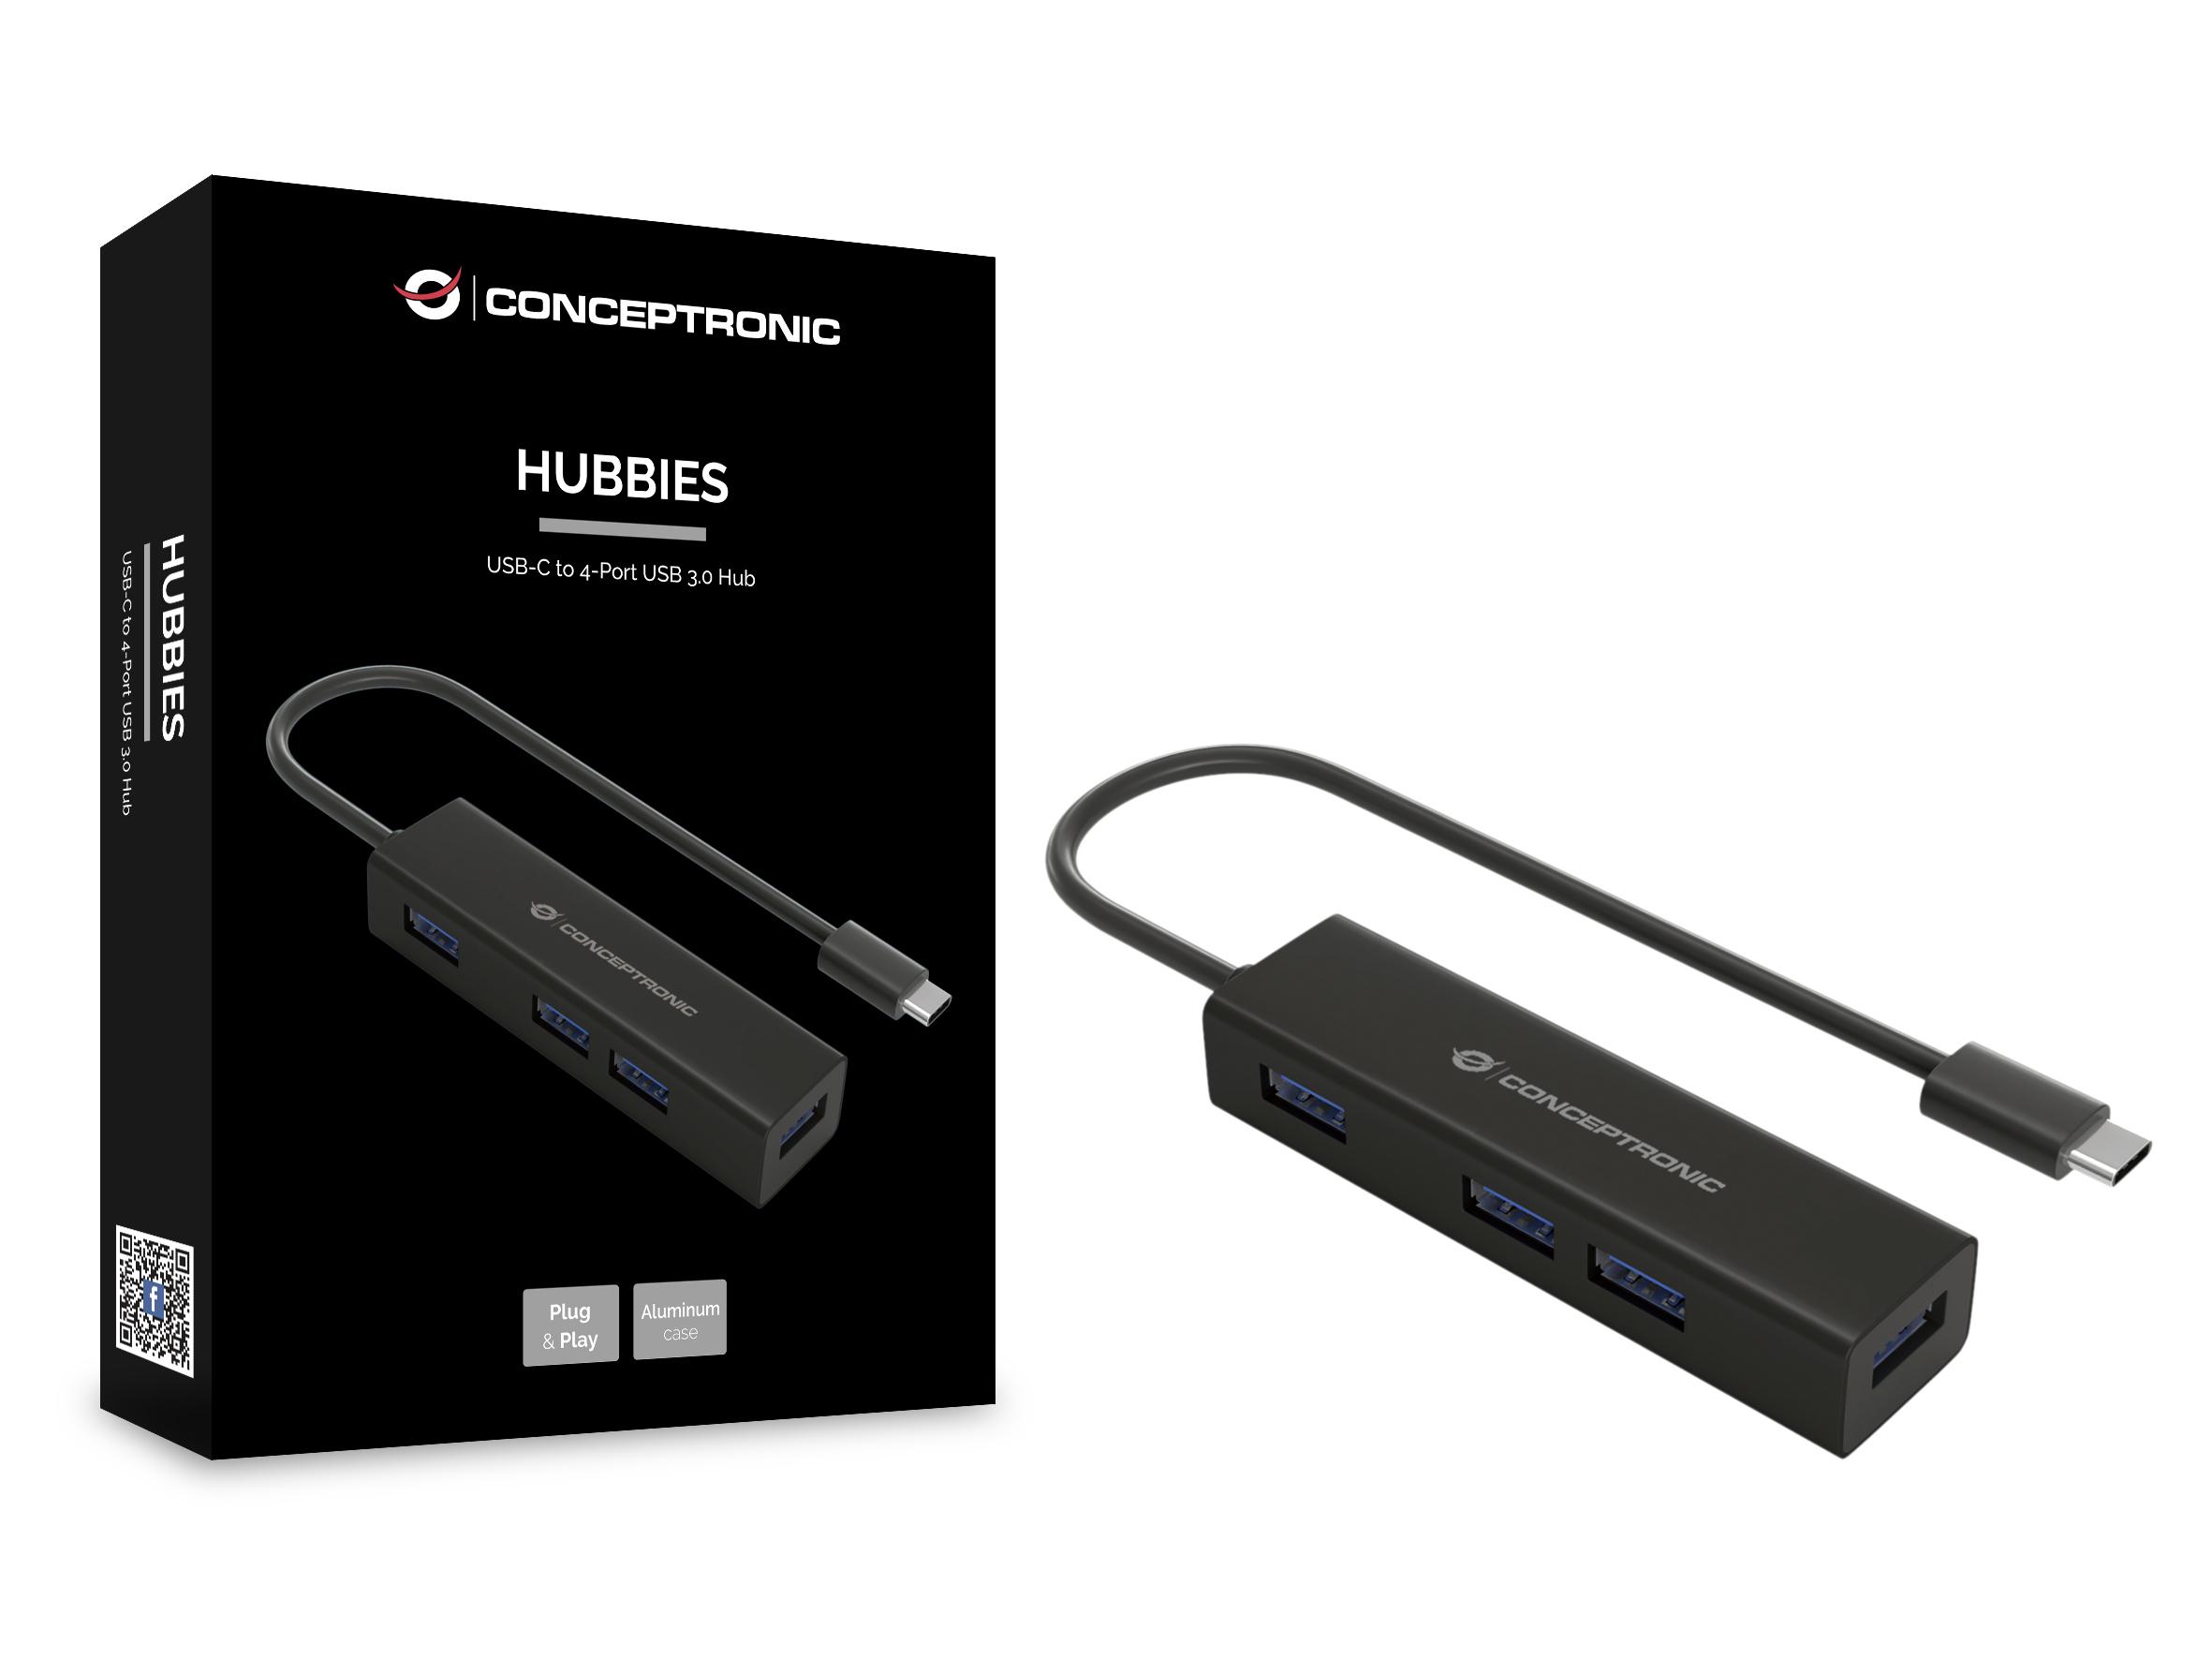 Conceptronic HUBBIES07B - Hub - 4 x SuperSpeed USB 3.0